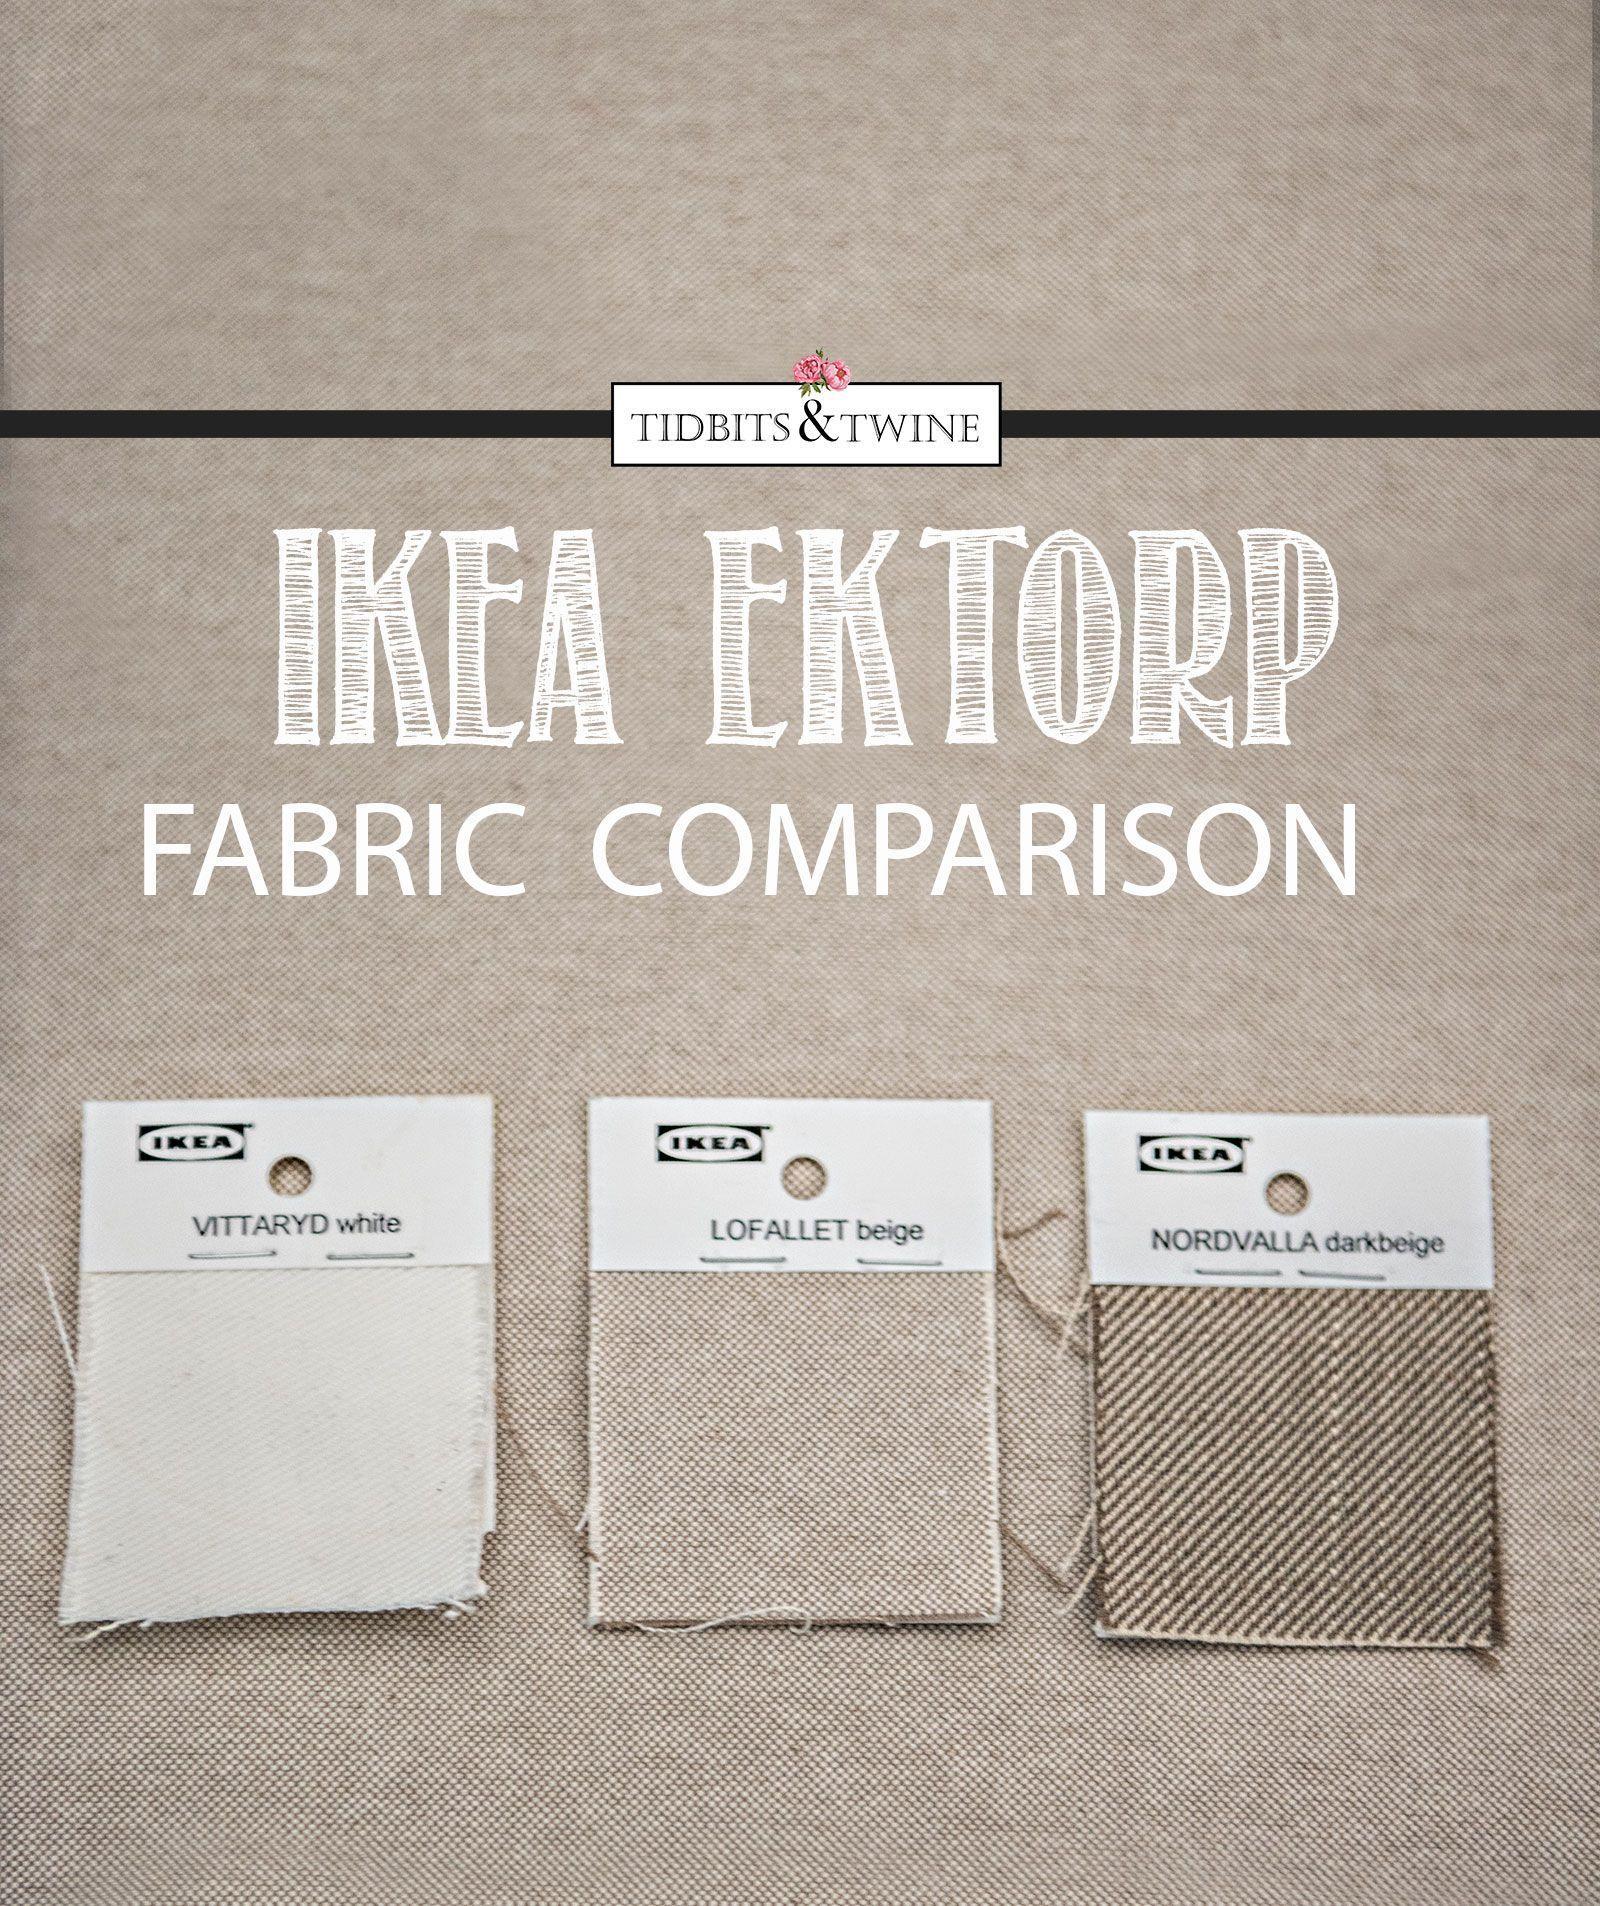 Ikea Ektorp Lofallet Beige Versus Vittaryd White And Nordvalla Dark Beige Ikea Ektorp Ektorp Sofa Ikea Ektorp Sectional